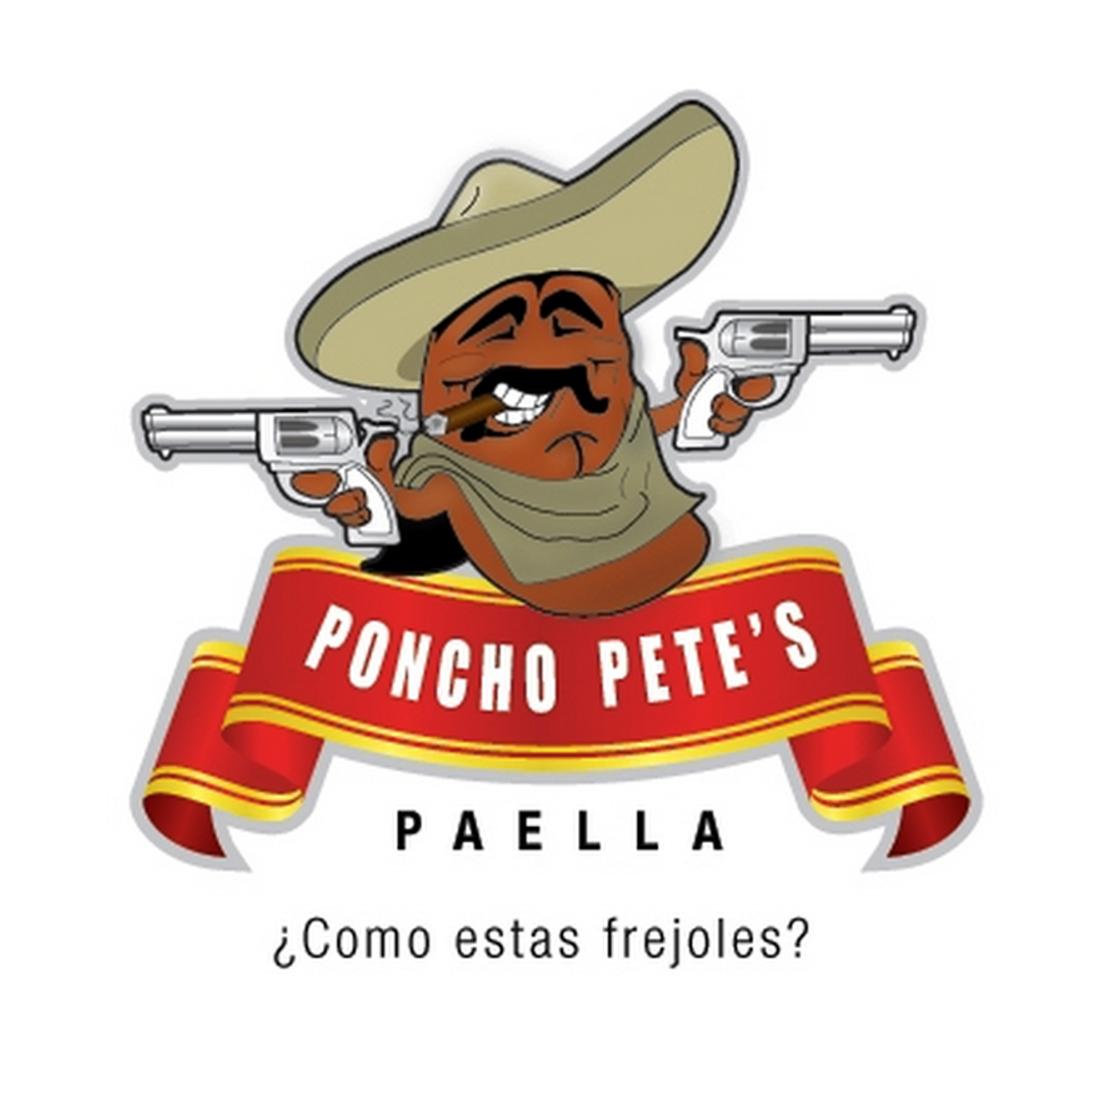 poncho pete's paella